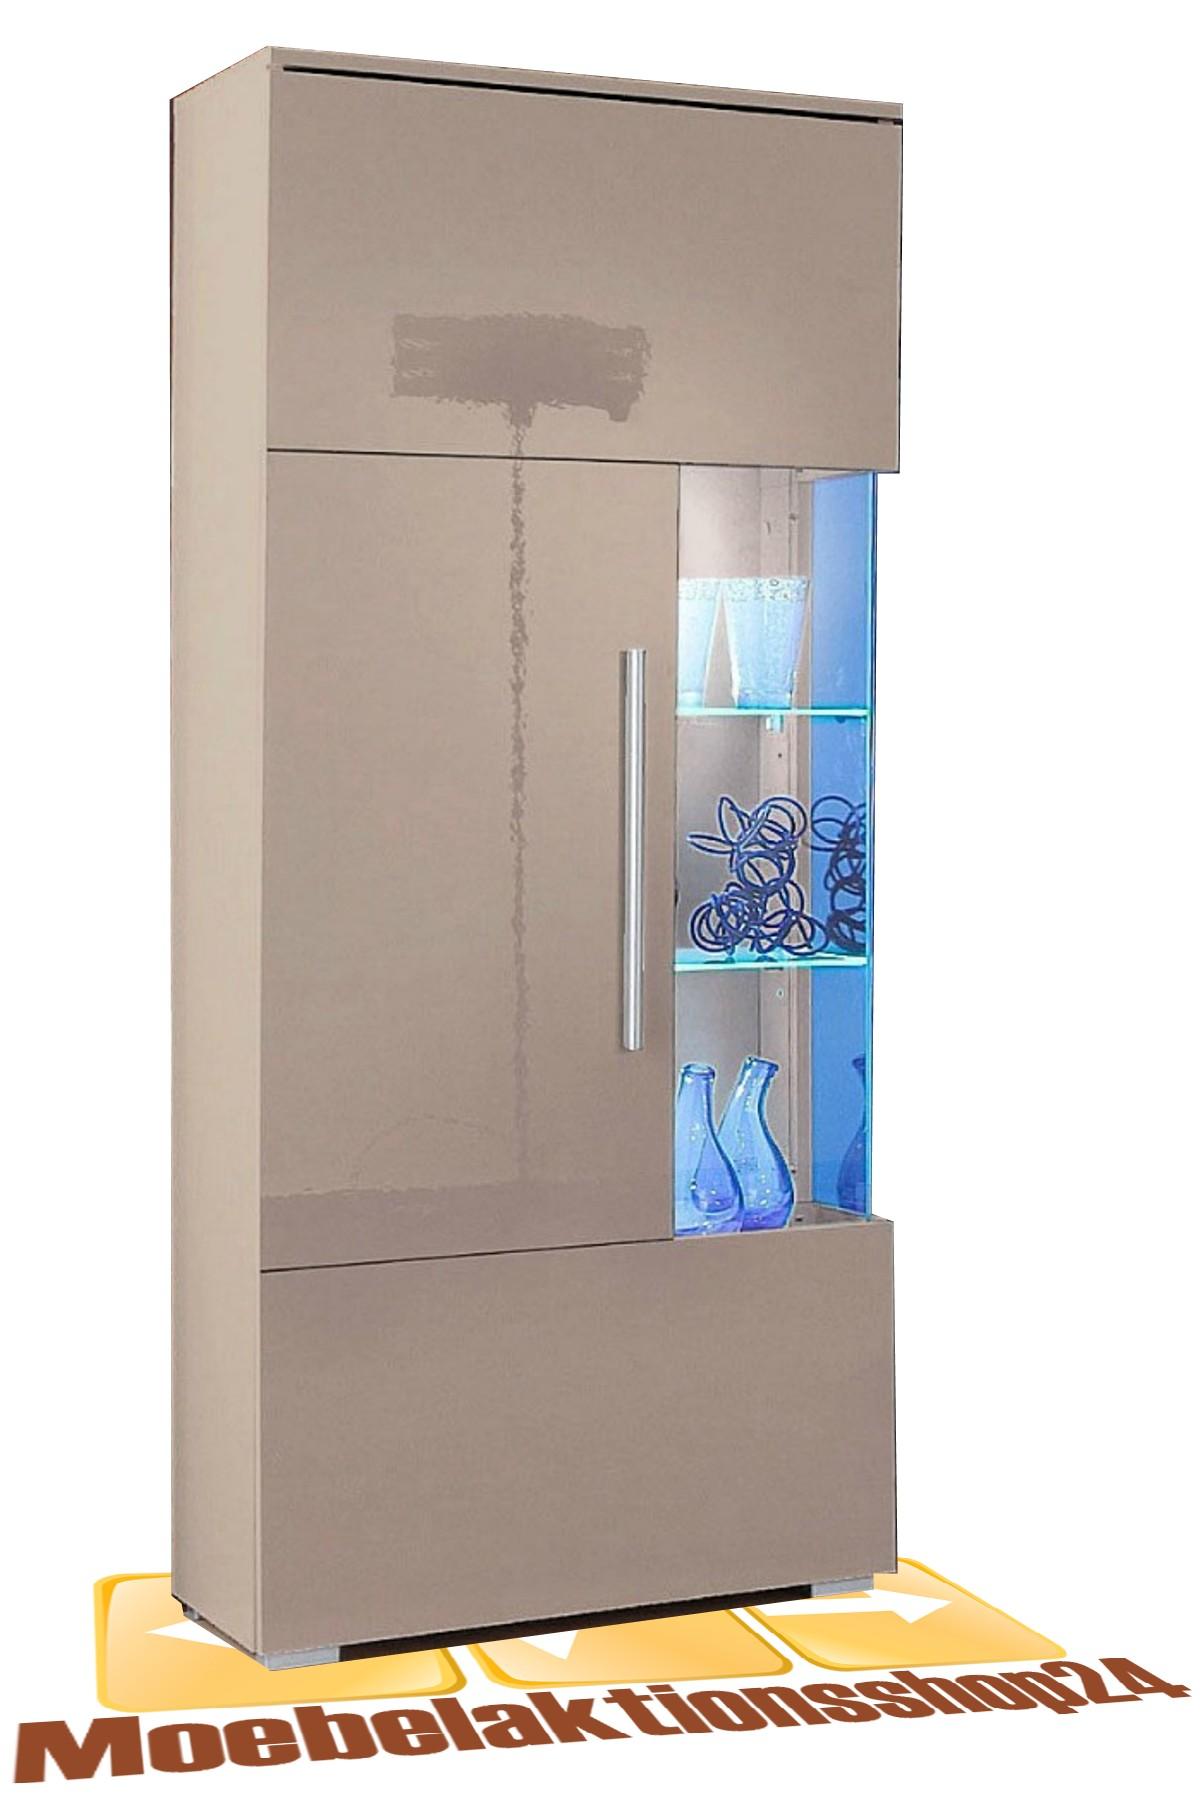 vitrine wohnwand wohnzimmer cappuccino hochglanz neu 398663 64a 65a 23 77a ebay. Black Bedroom Furniture Sets. Home Design Ideas